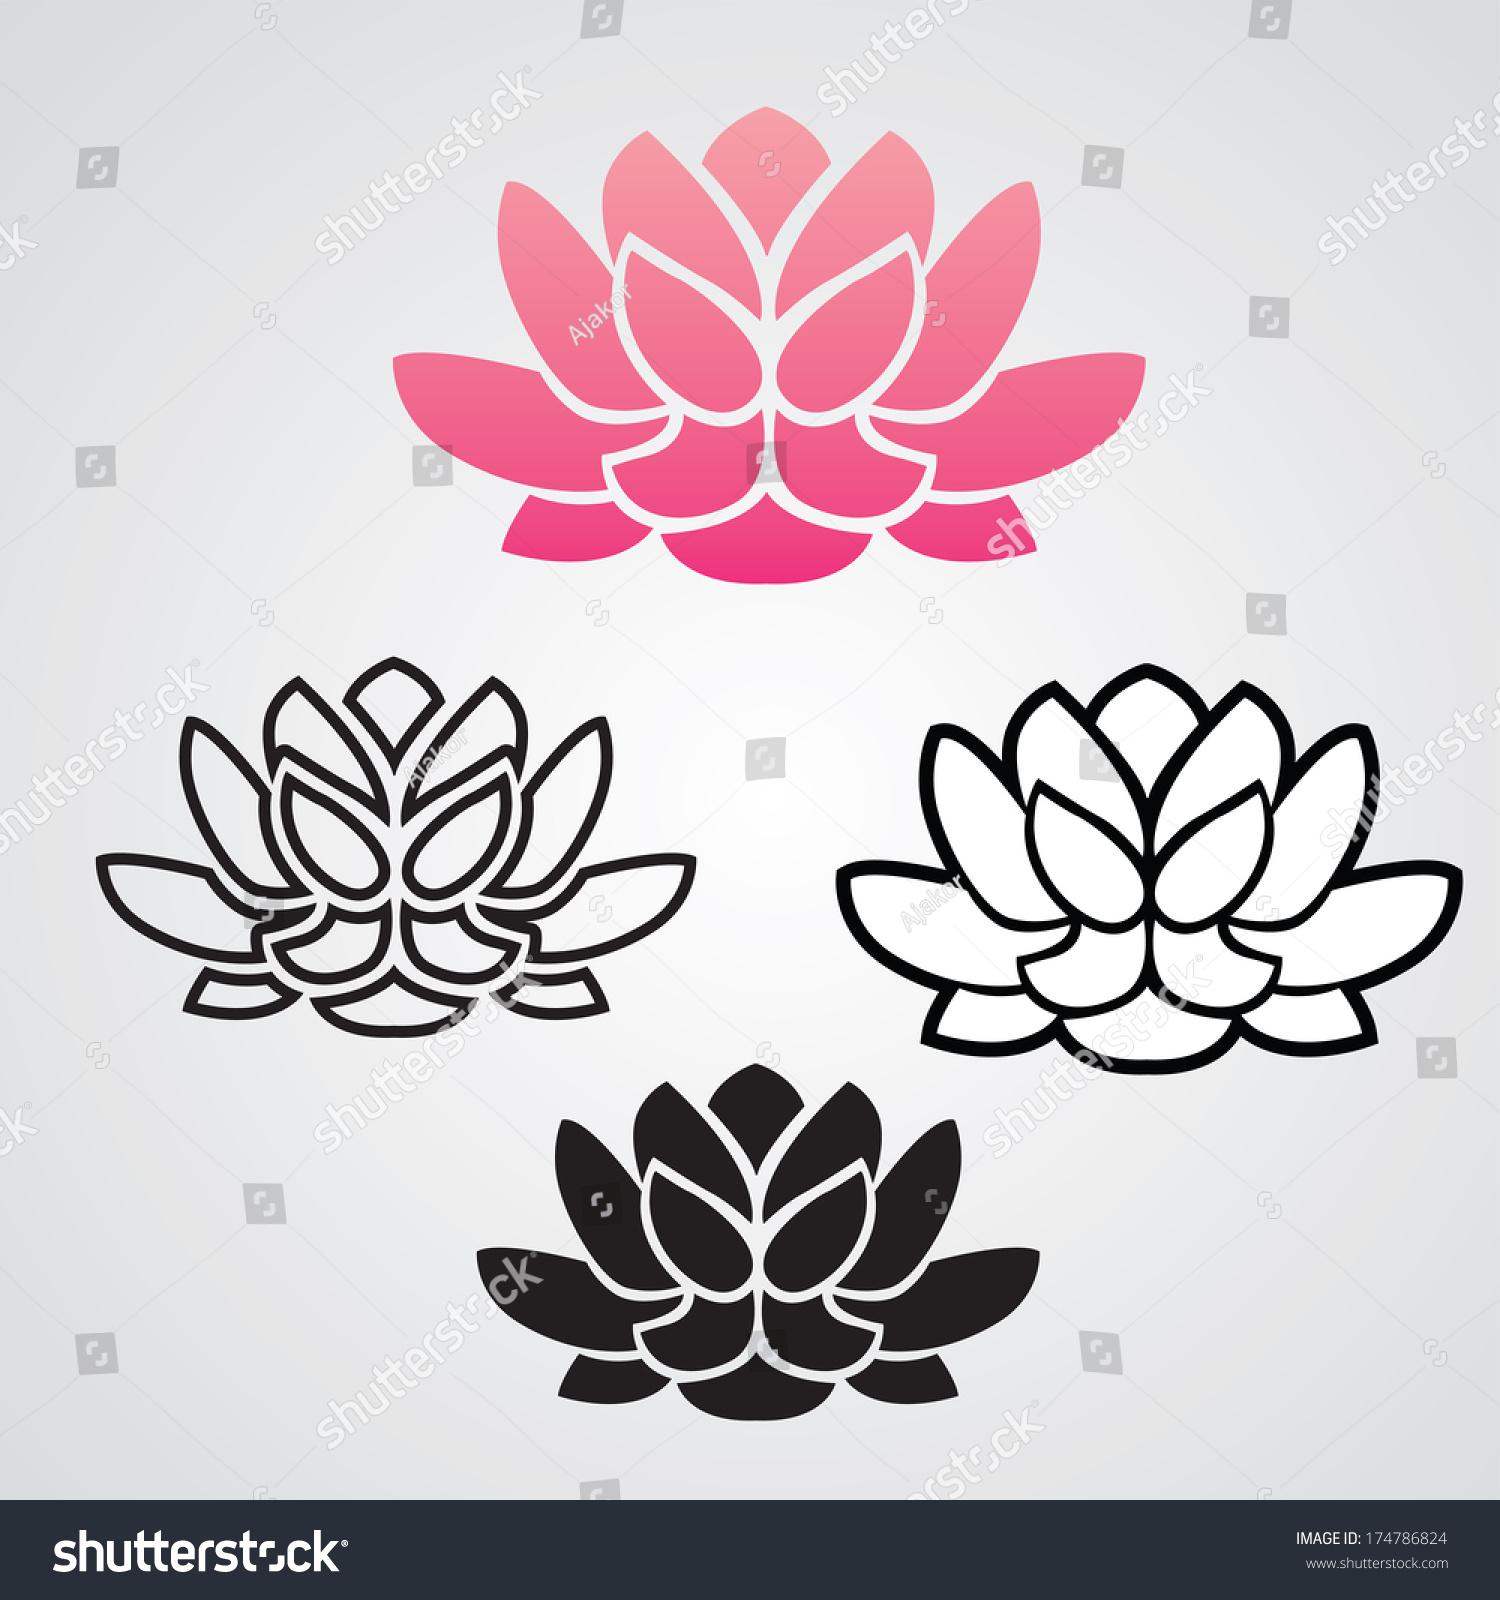 Symbol yoga lotus flower graphic vector stock photo photo vector the symbol of yoga lotus flower graphic vector illustration izmirmasajfo